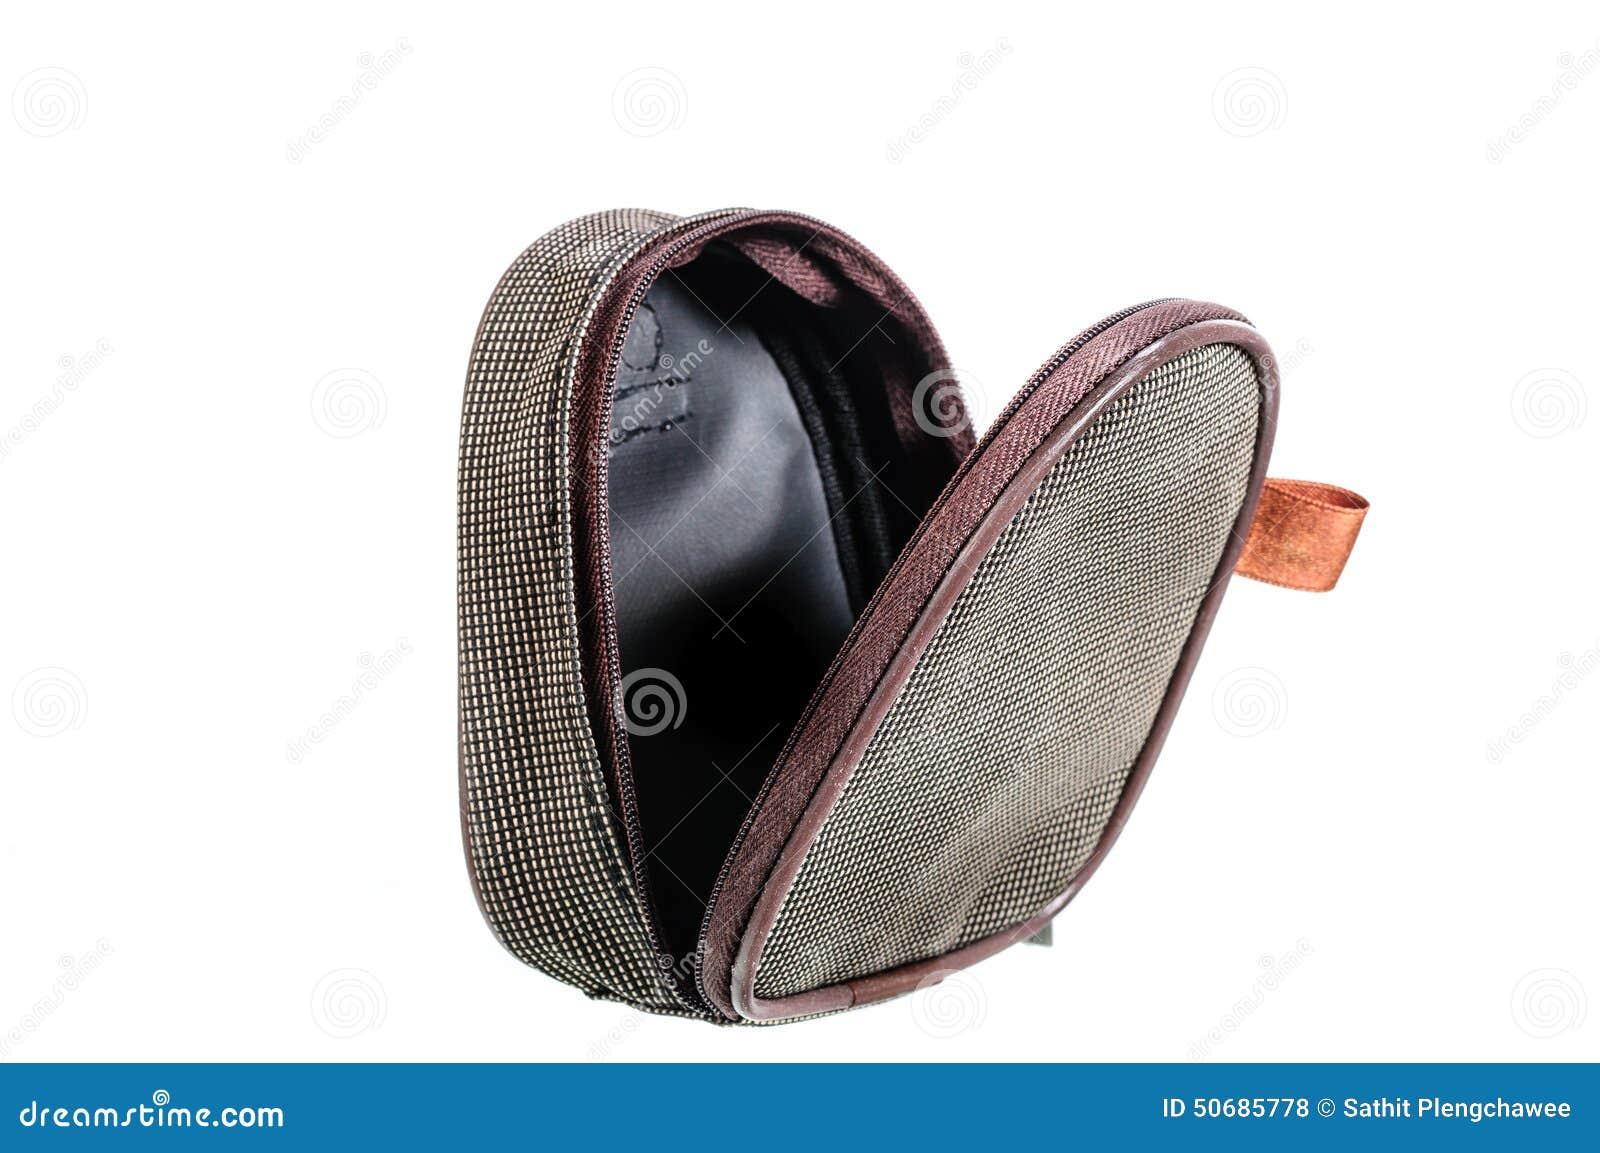 Download 布朗镶边了盒或钱包 库存照片. 图片 包括有 唯一, 旅行, 必要, 对象, 工具箱, 案件, 背包, 财富 - 50685778